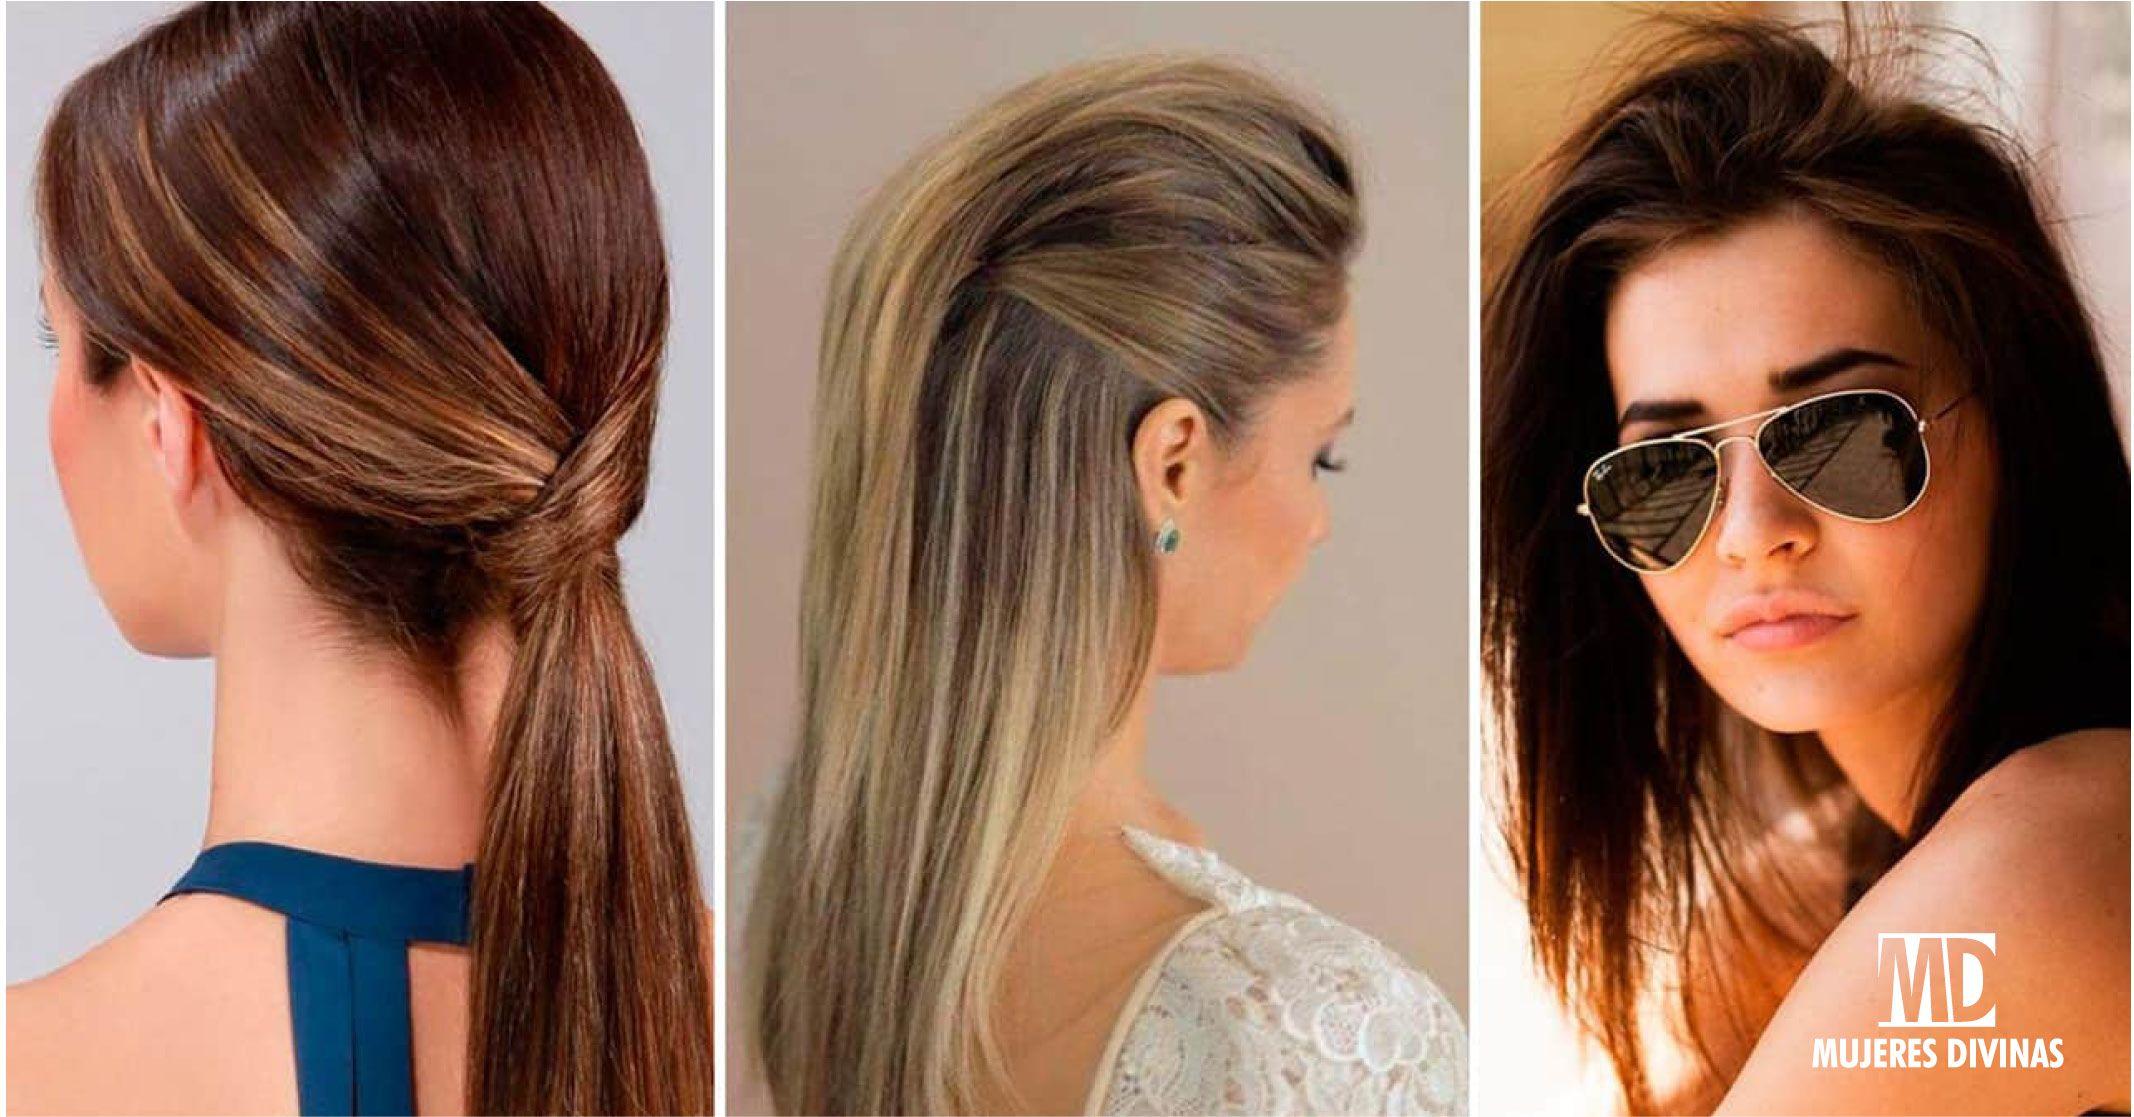 Ideas bonitas para peinados para caras alargadas Galeria De Cortes De Cabello Estilo - Pin on Peinados para CARAS ALARGADAS